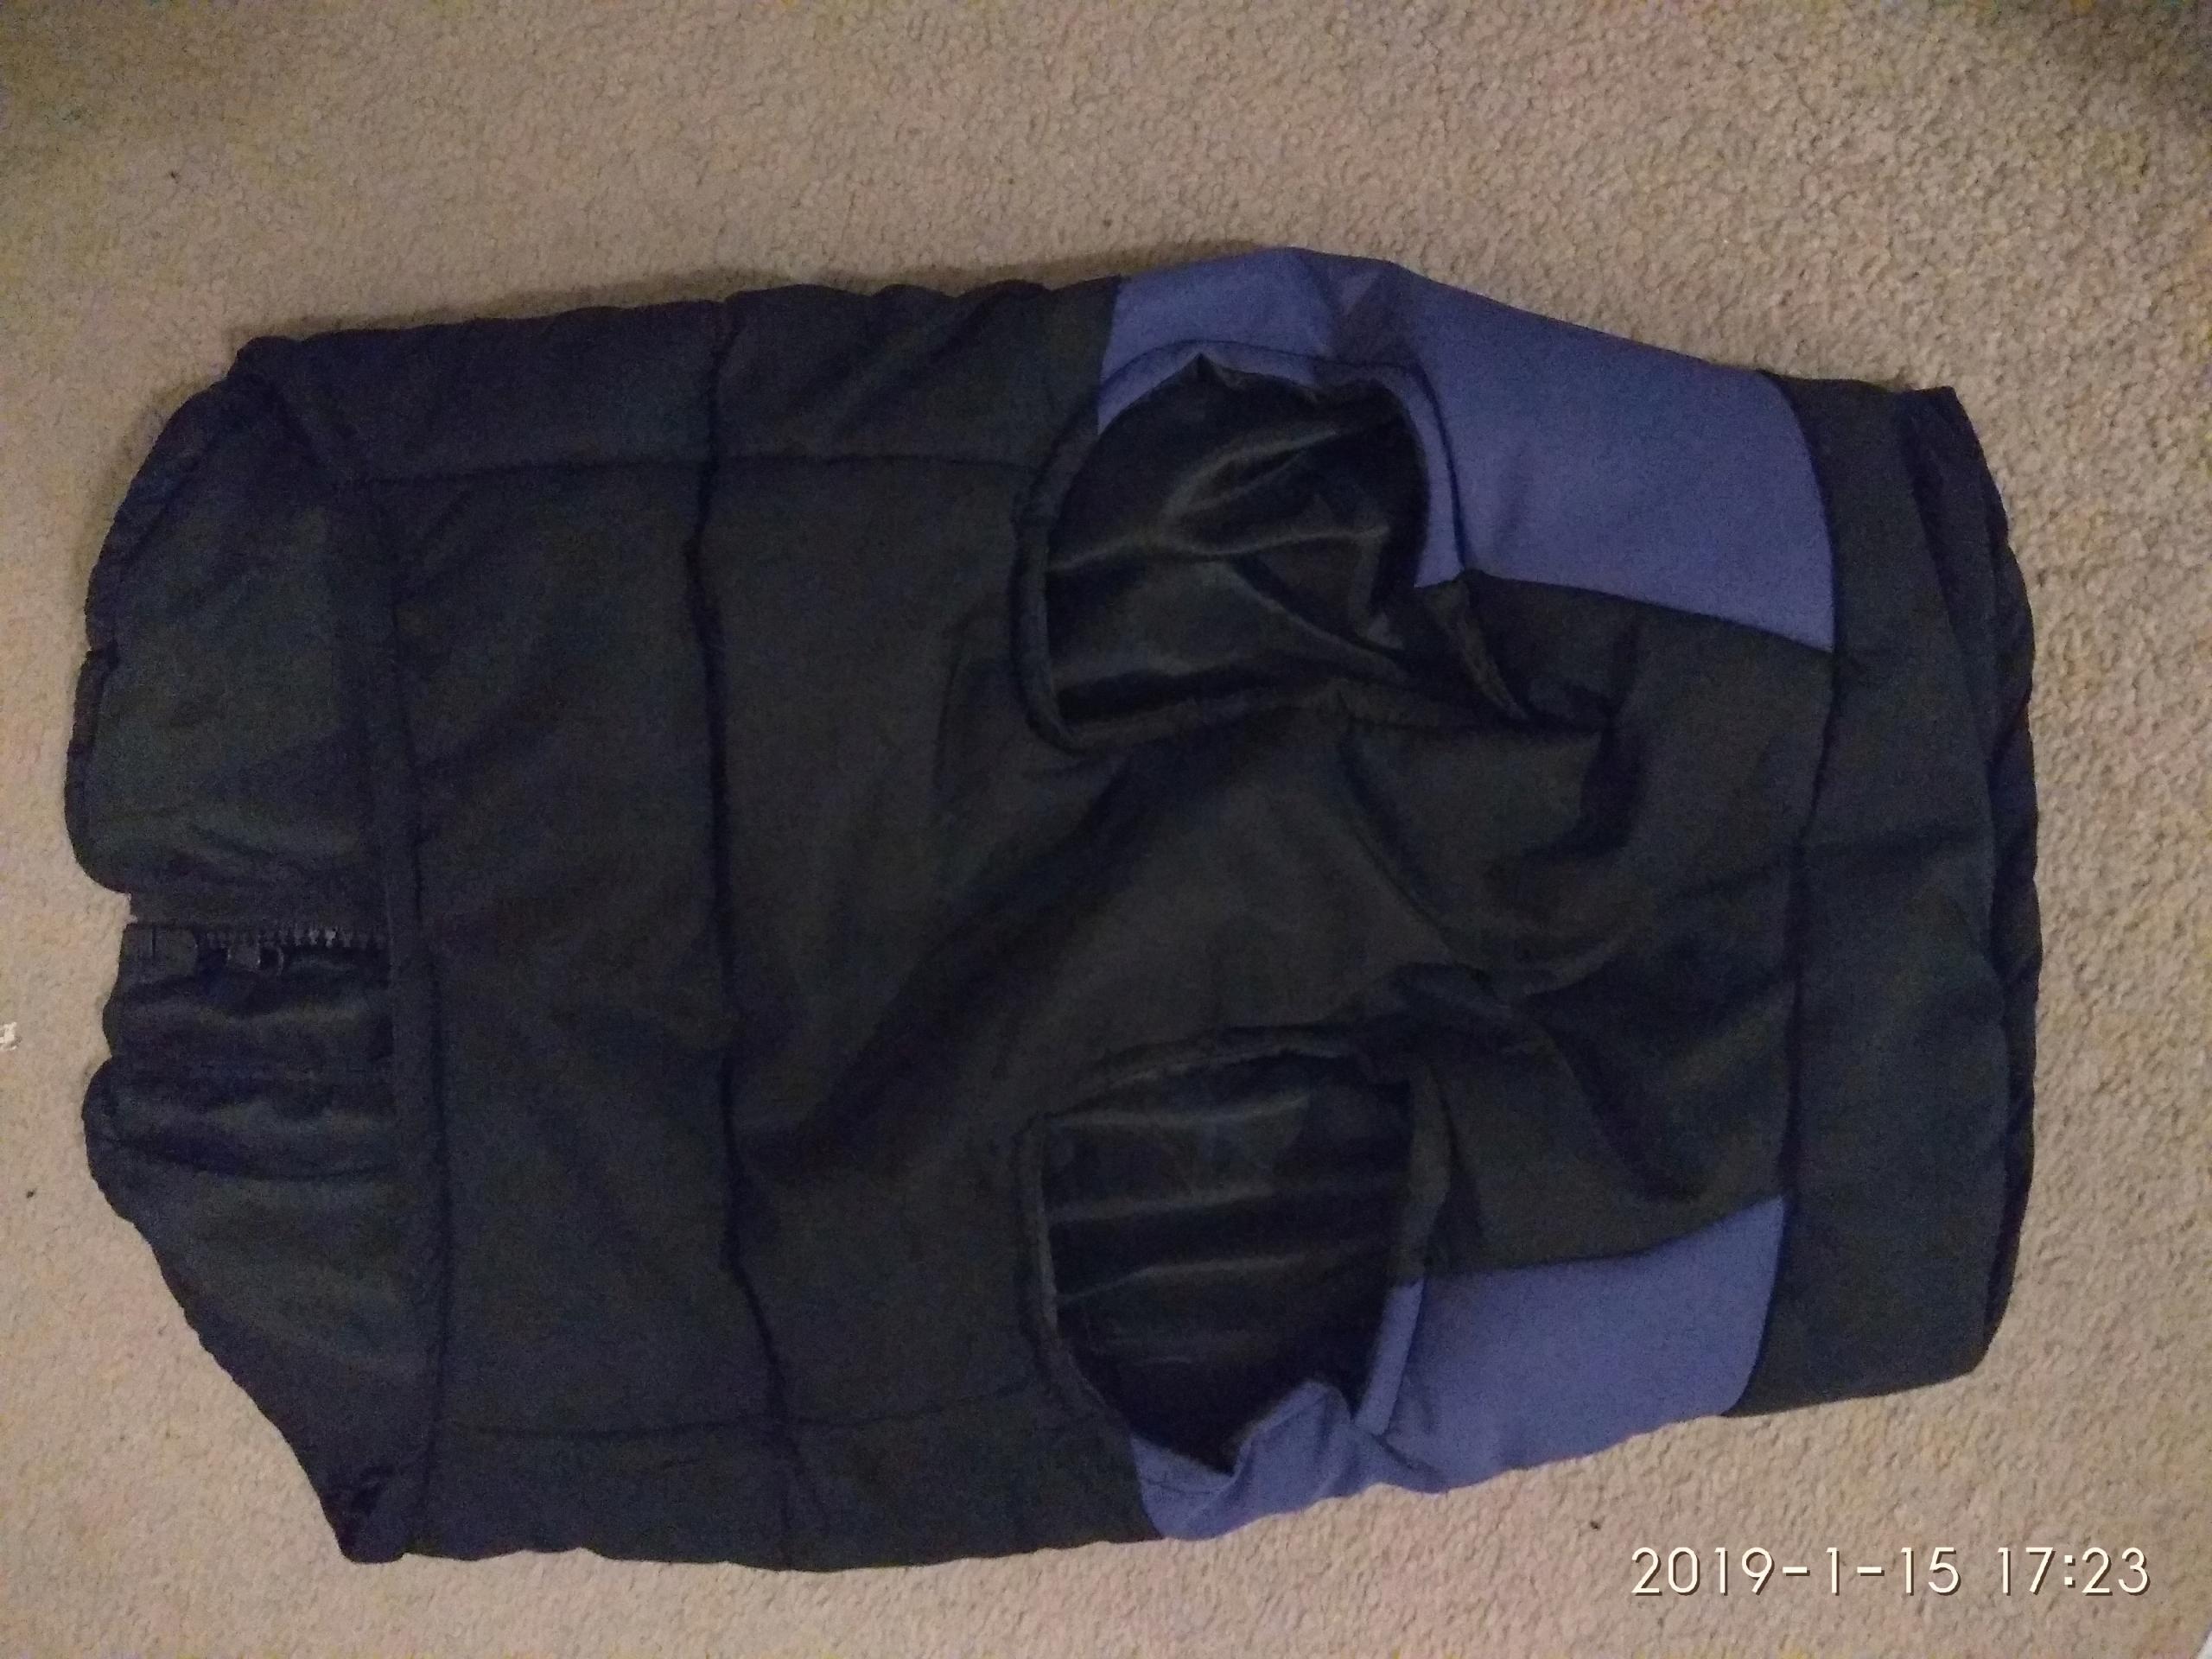 Kamizelka kurtka ubranko dla psa